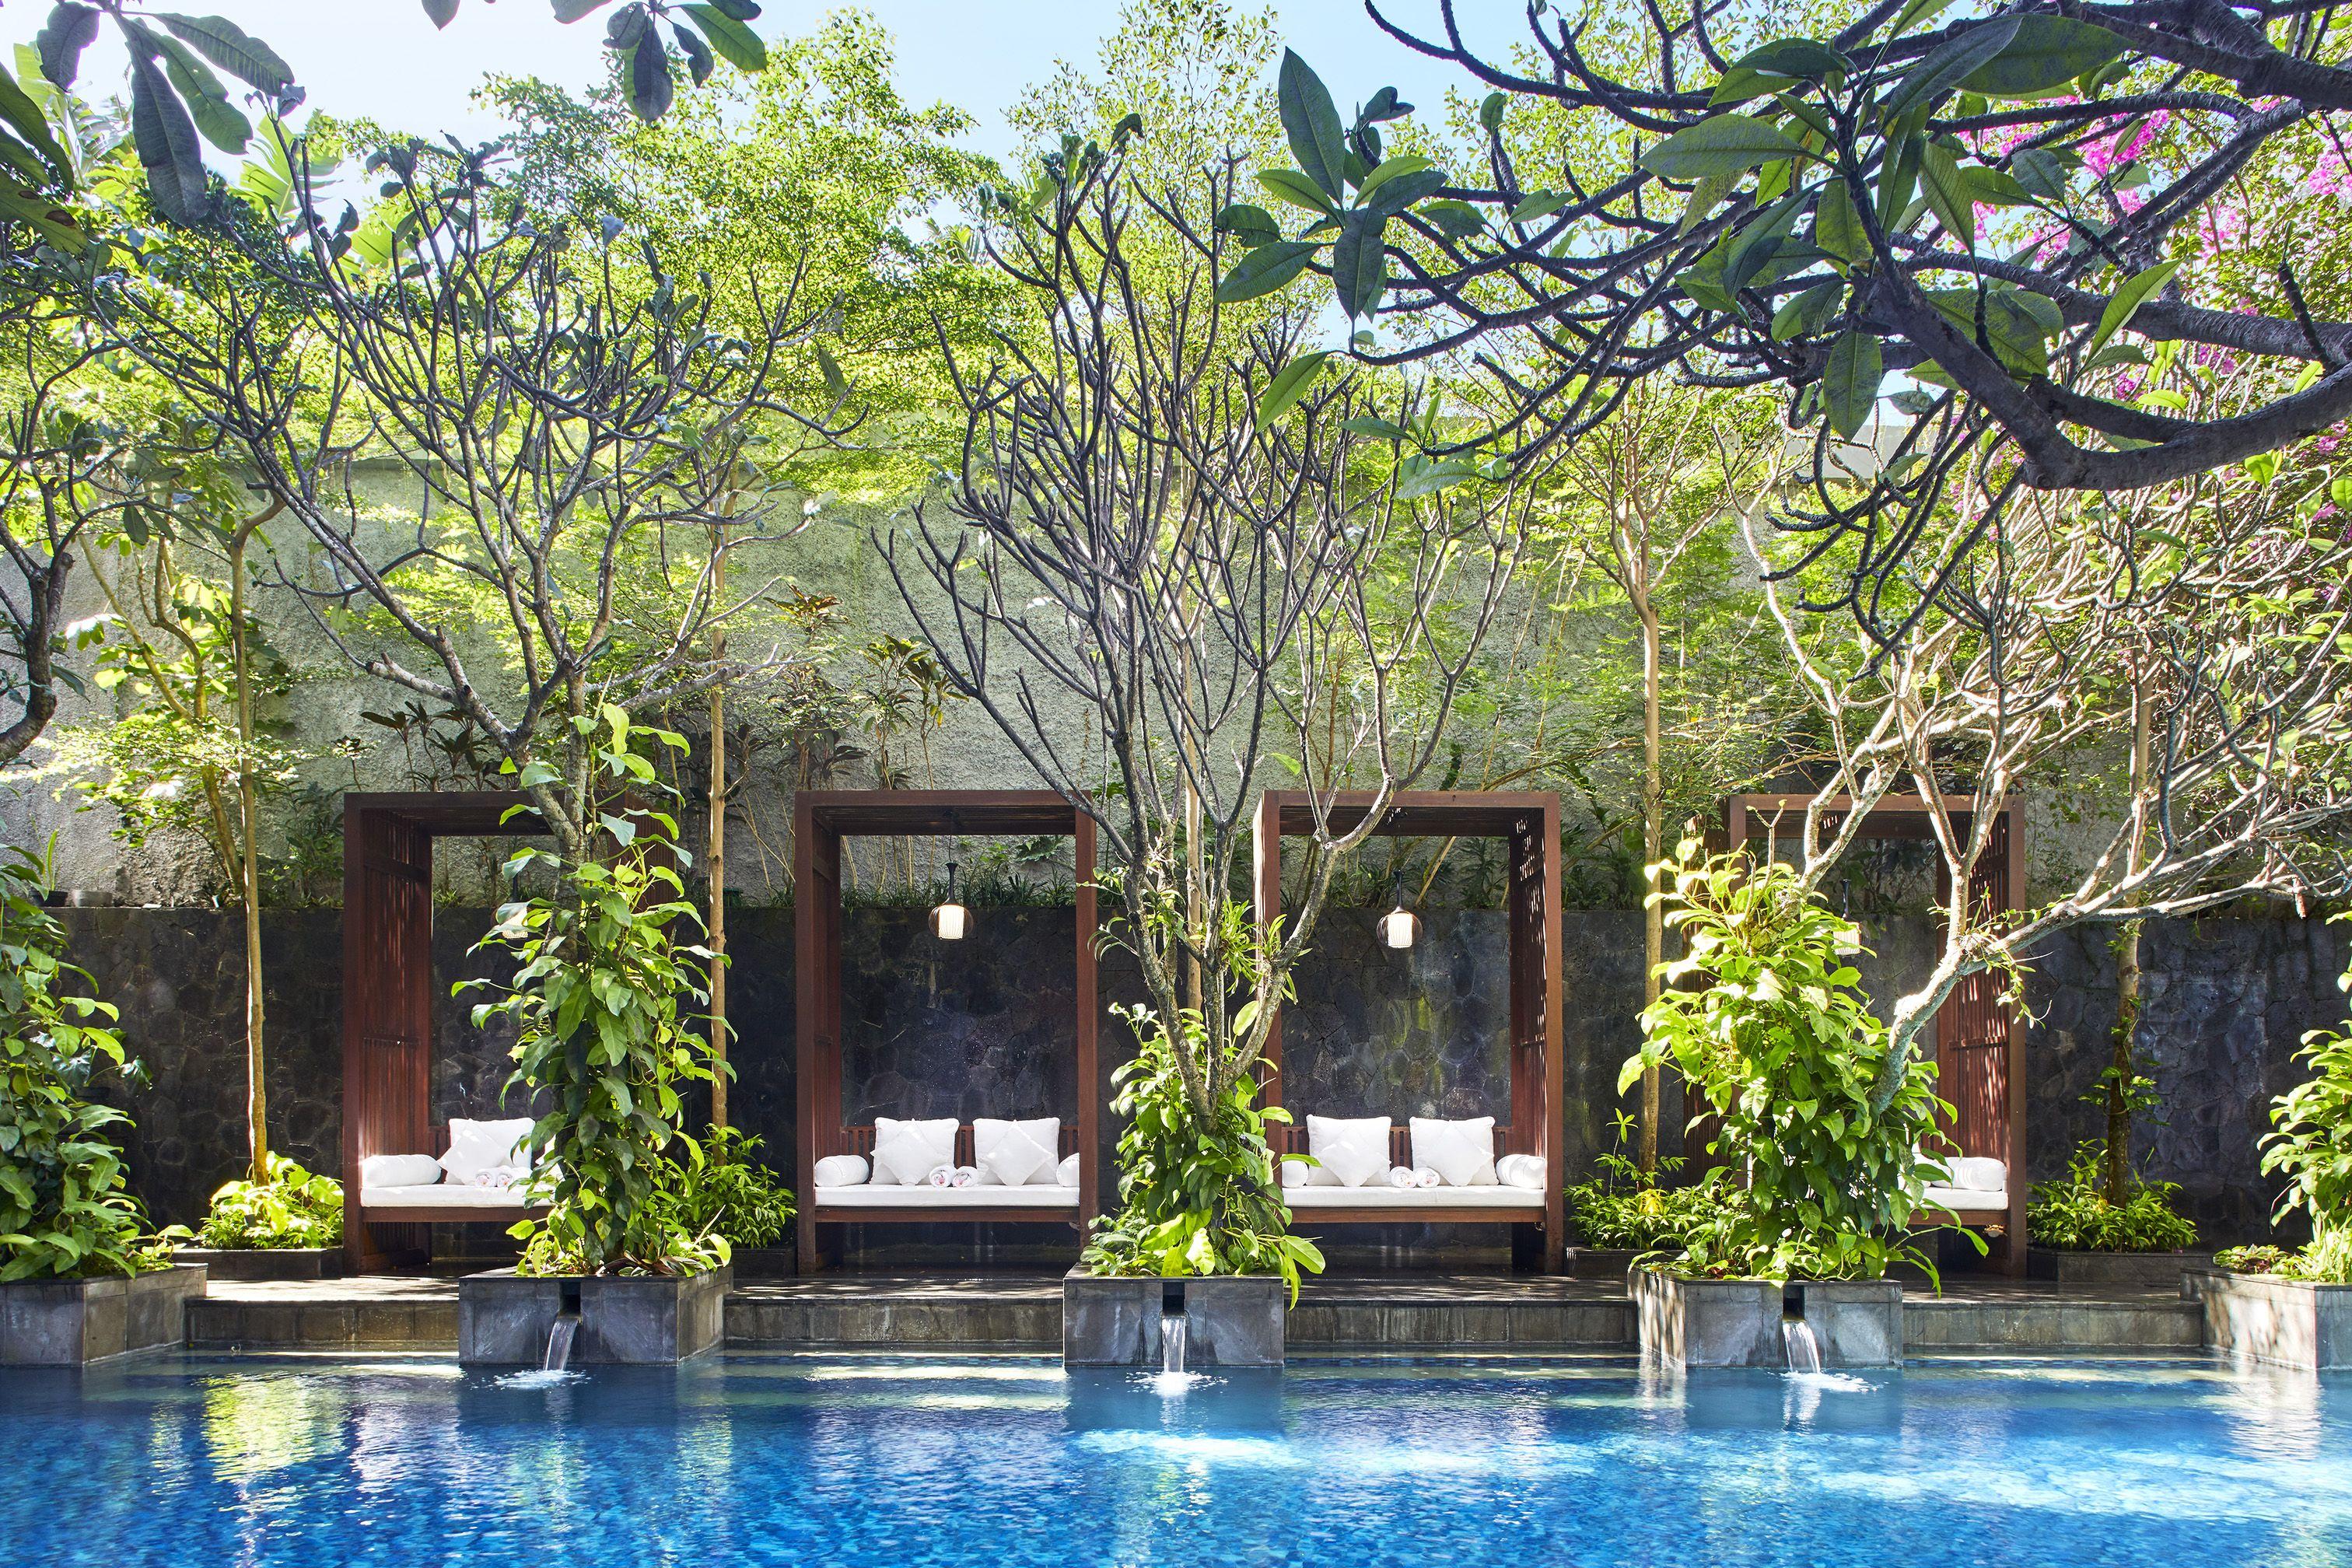 Jambuluwuk Oceano Seminyak Hotel, Badung